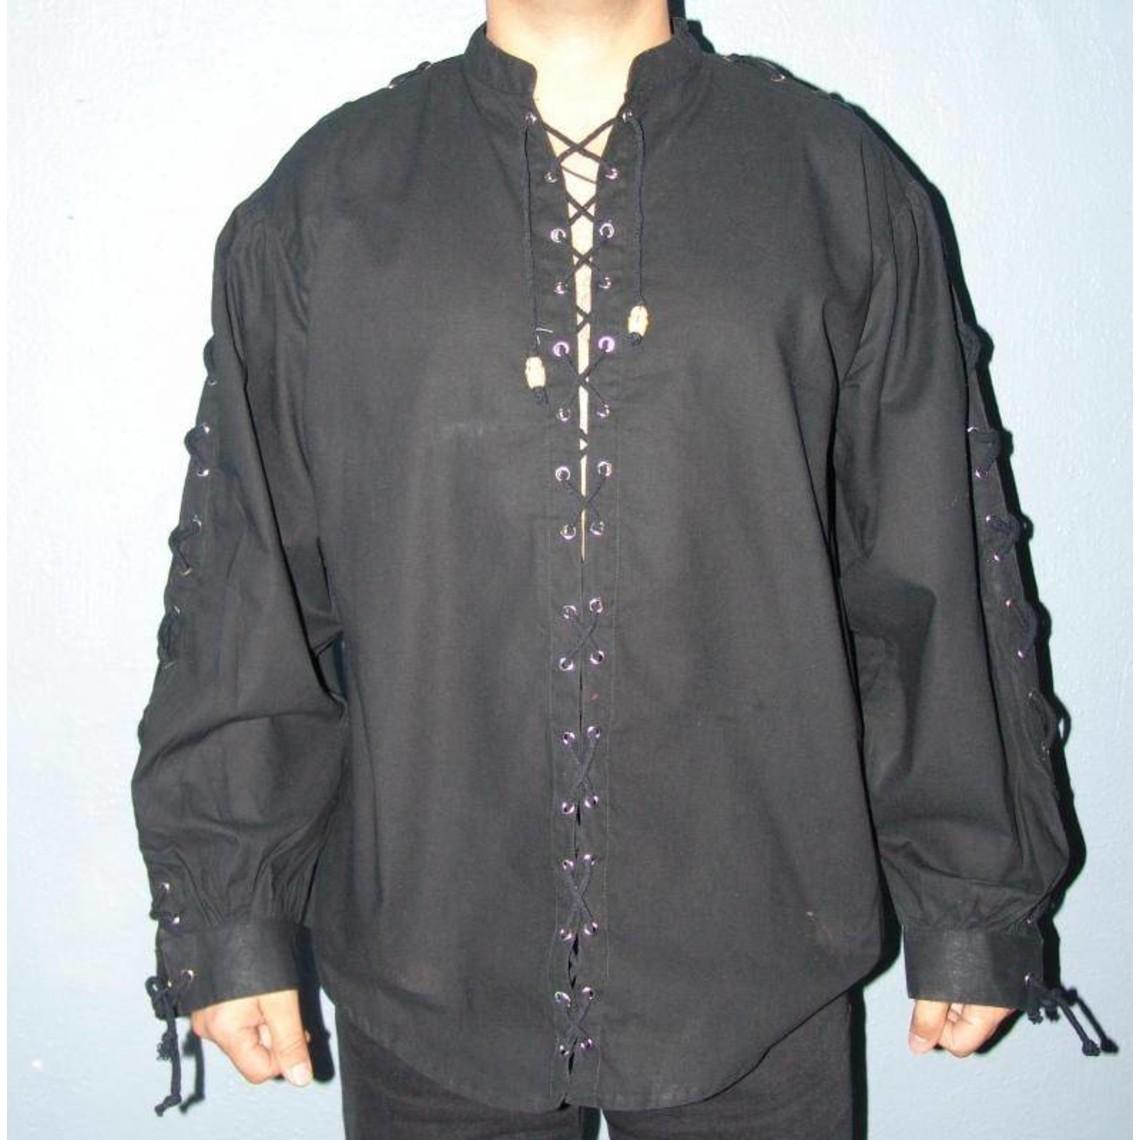 Leonardo Carbone Camisa con cordones